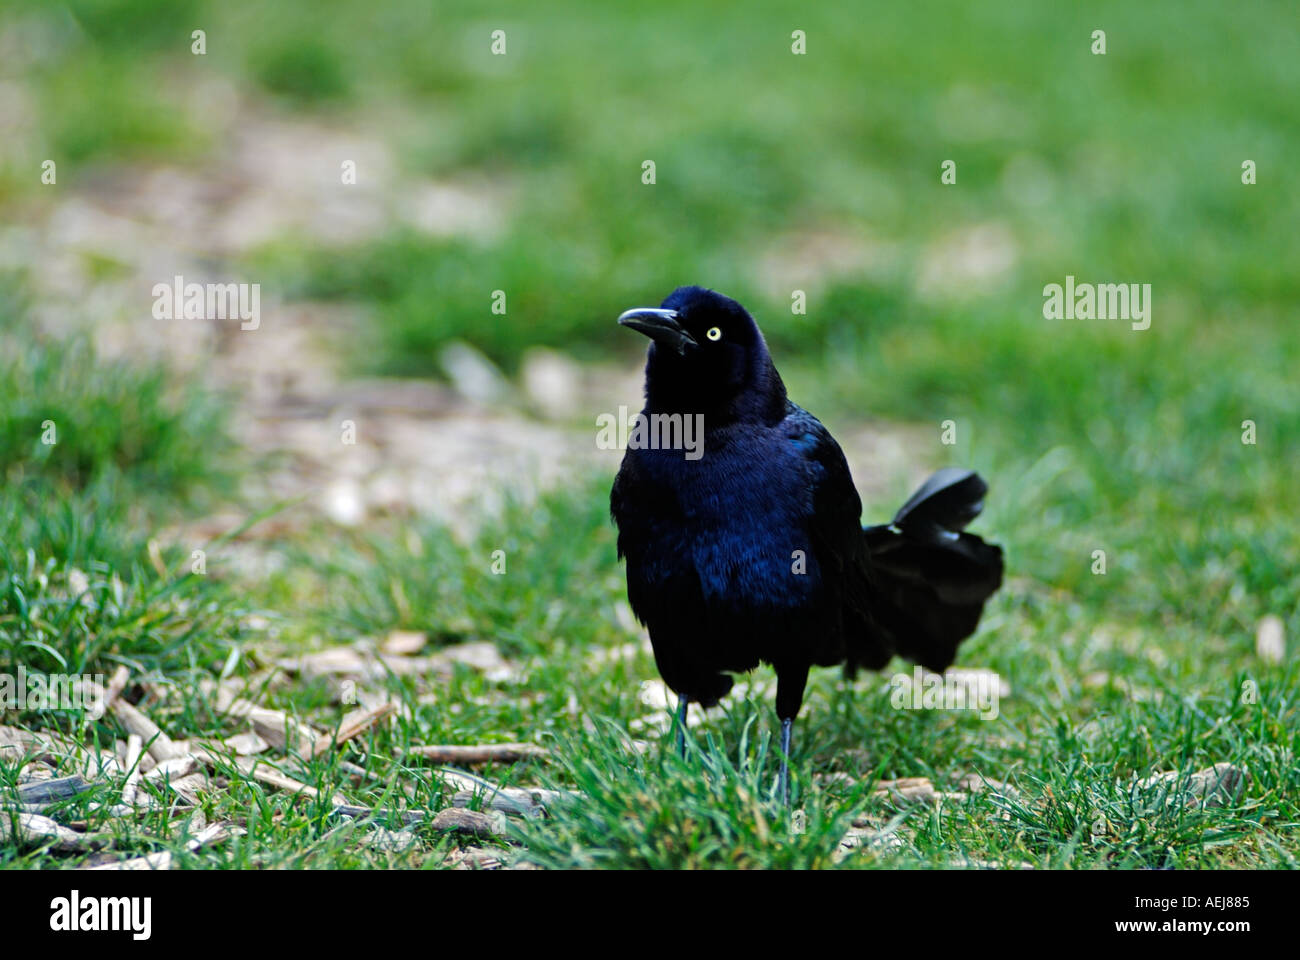 Black raven bird - Stock Image